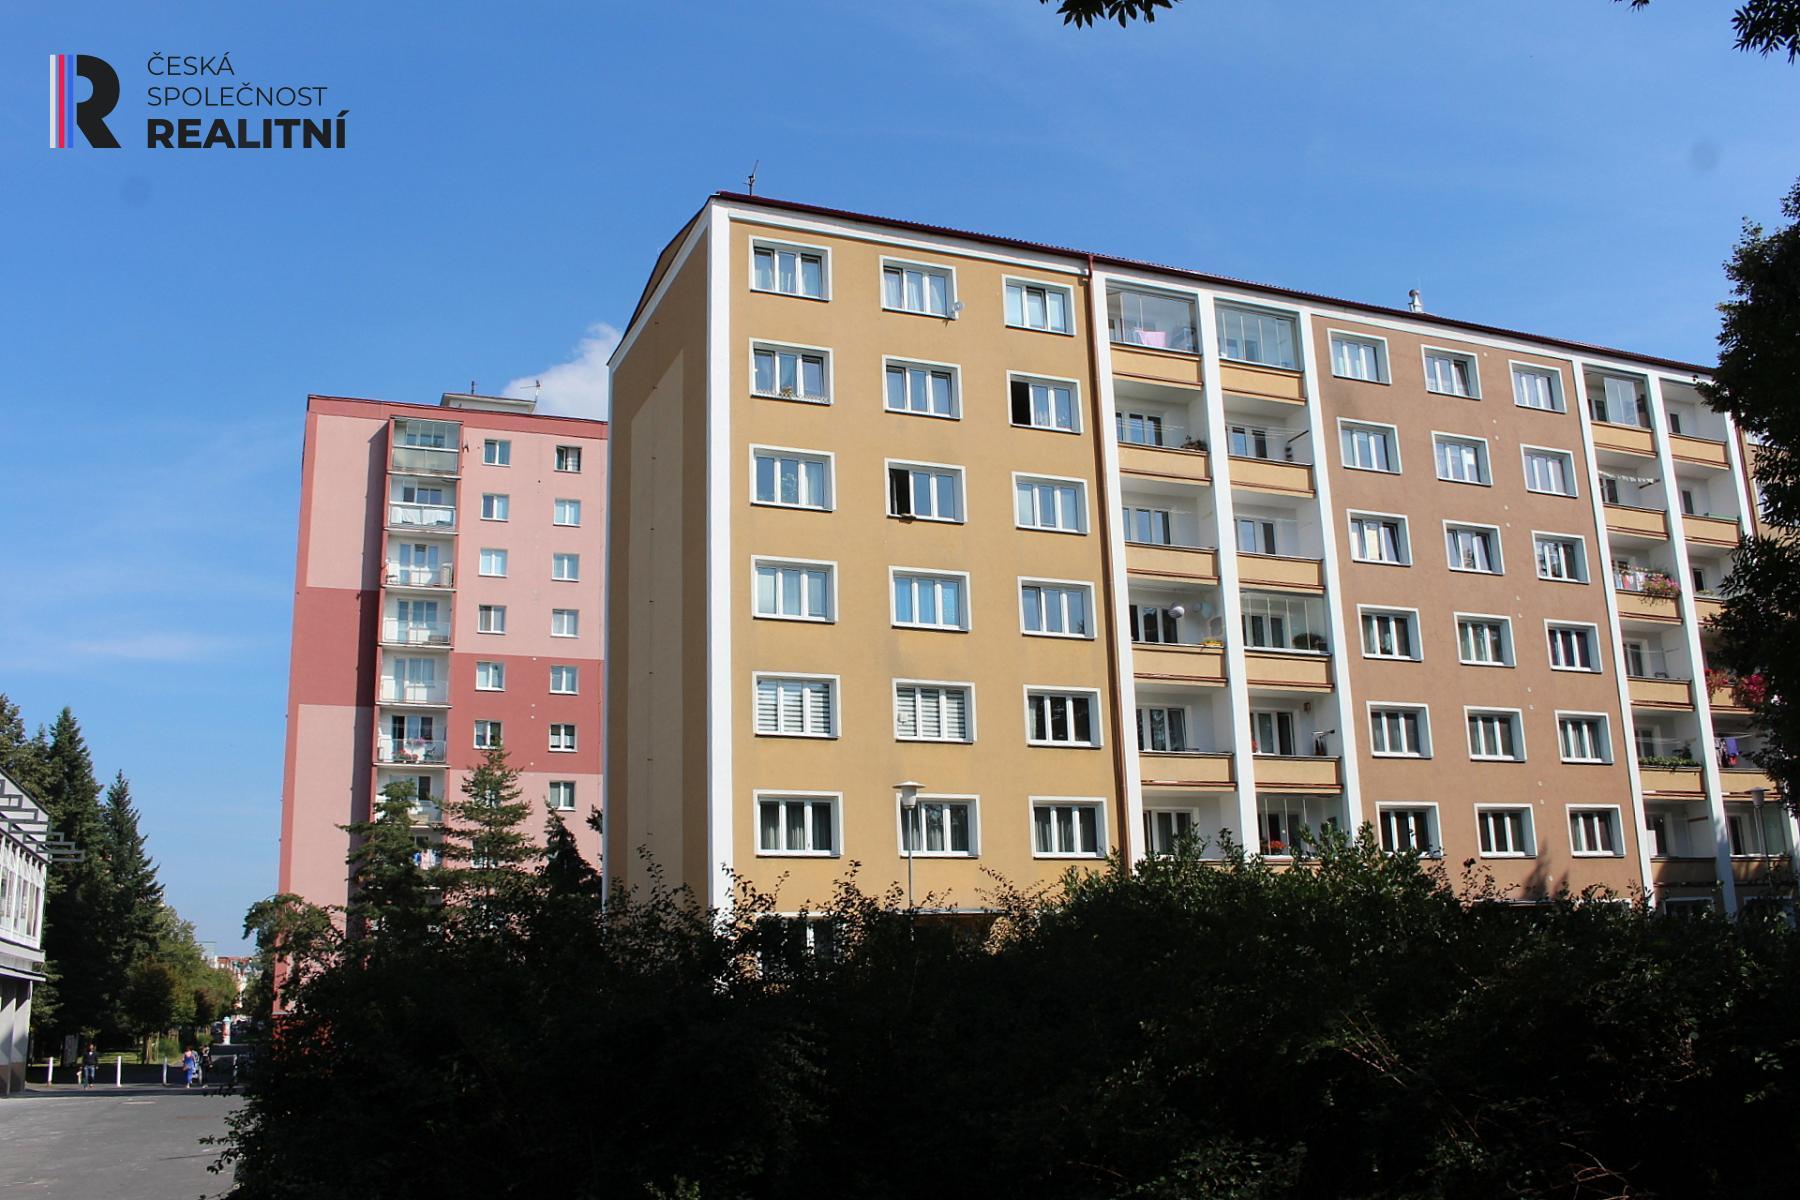 Pronájem bytu 2+1 Tuhnice, Karlovy Vary